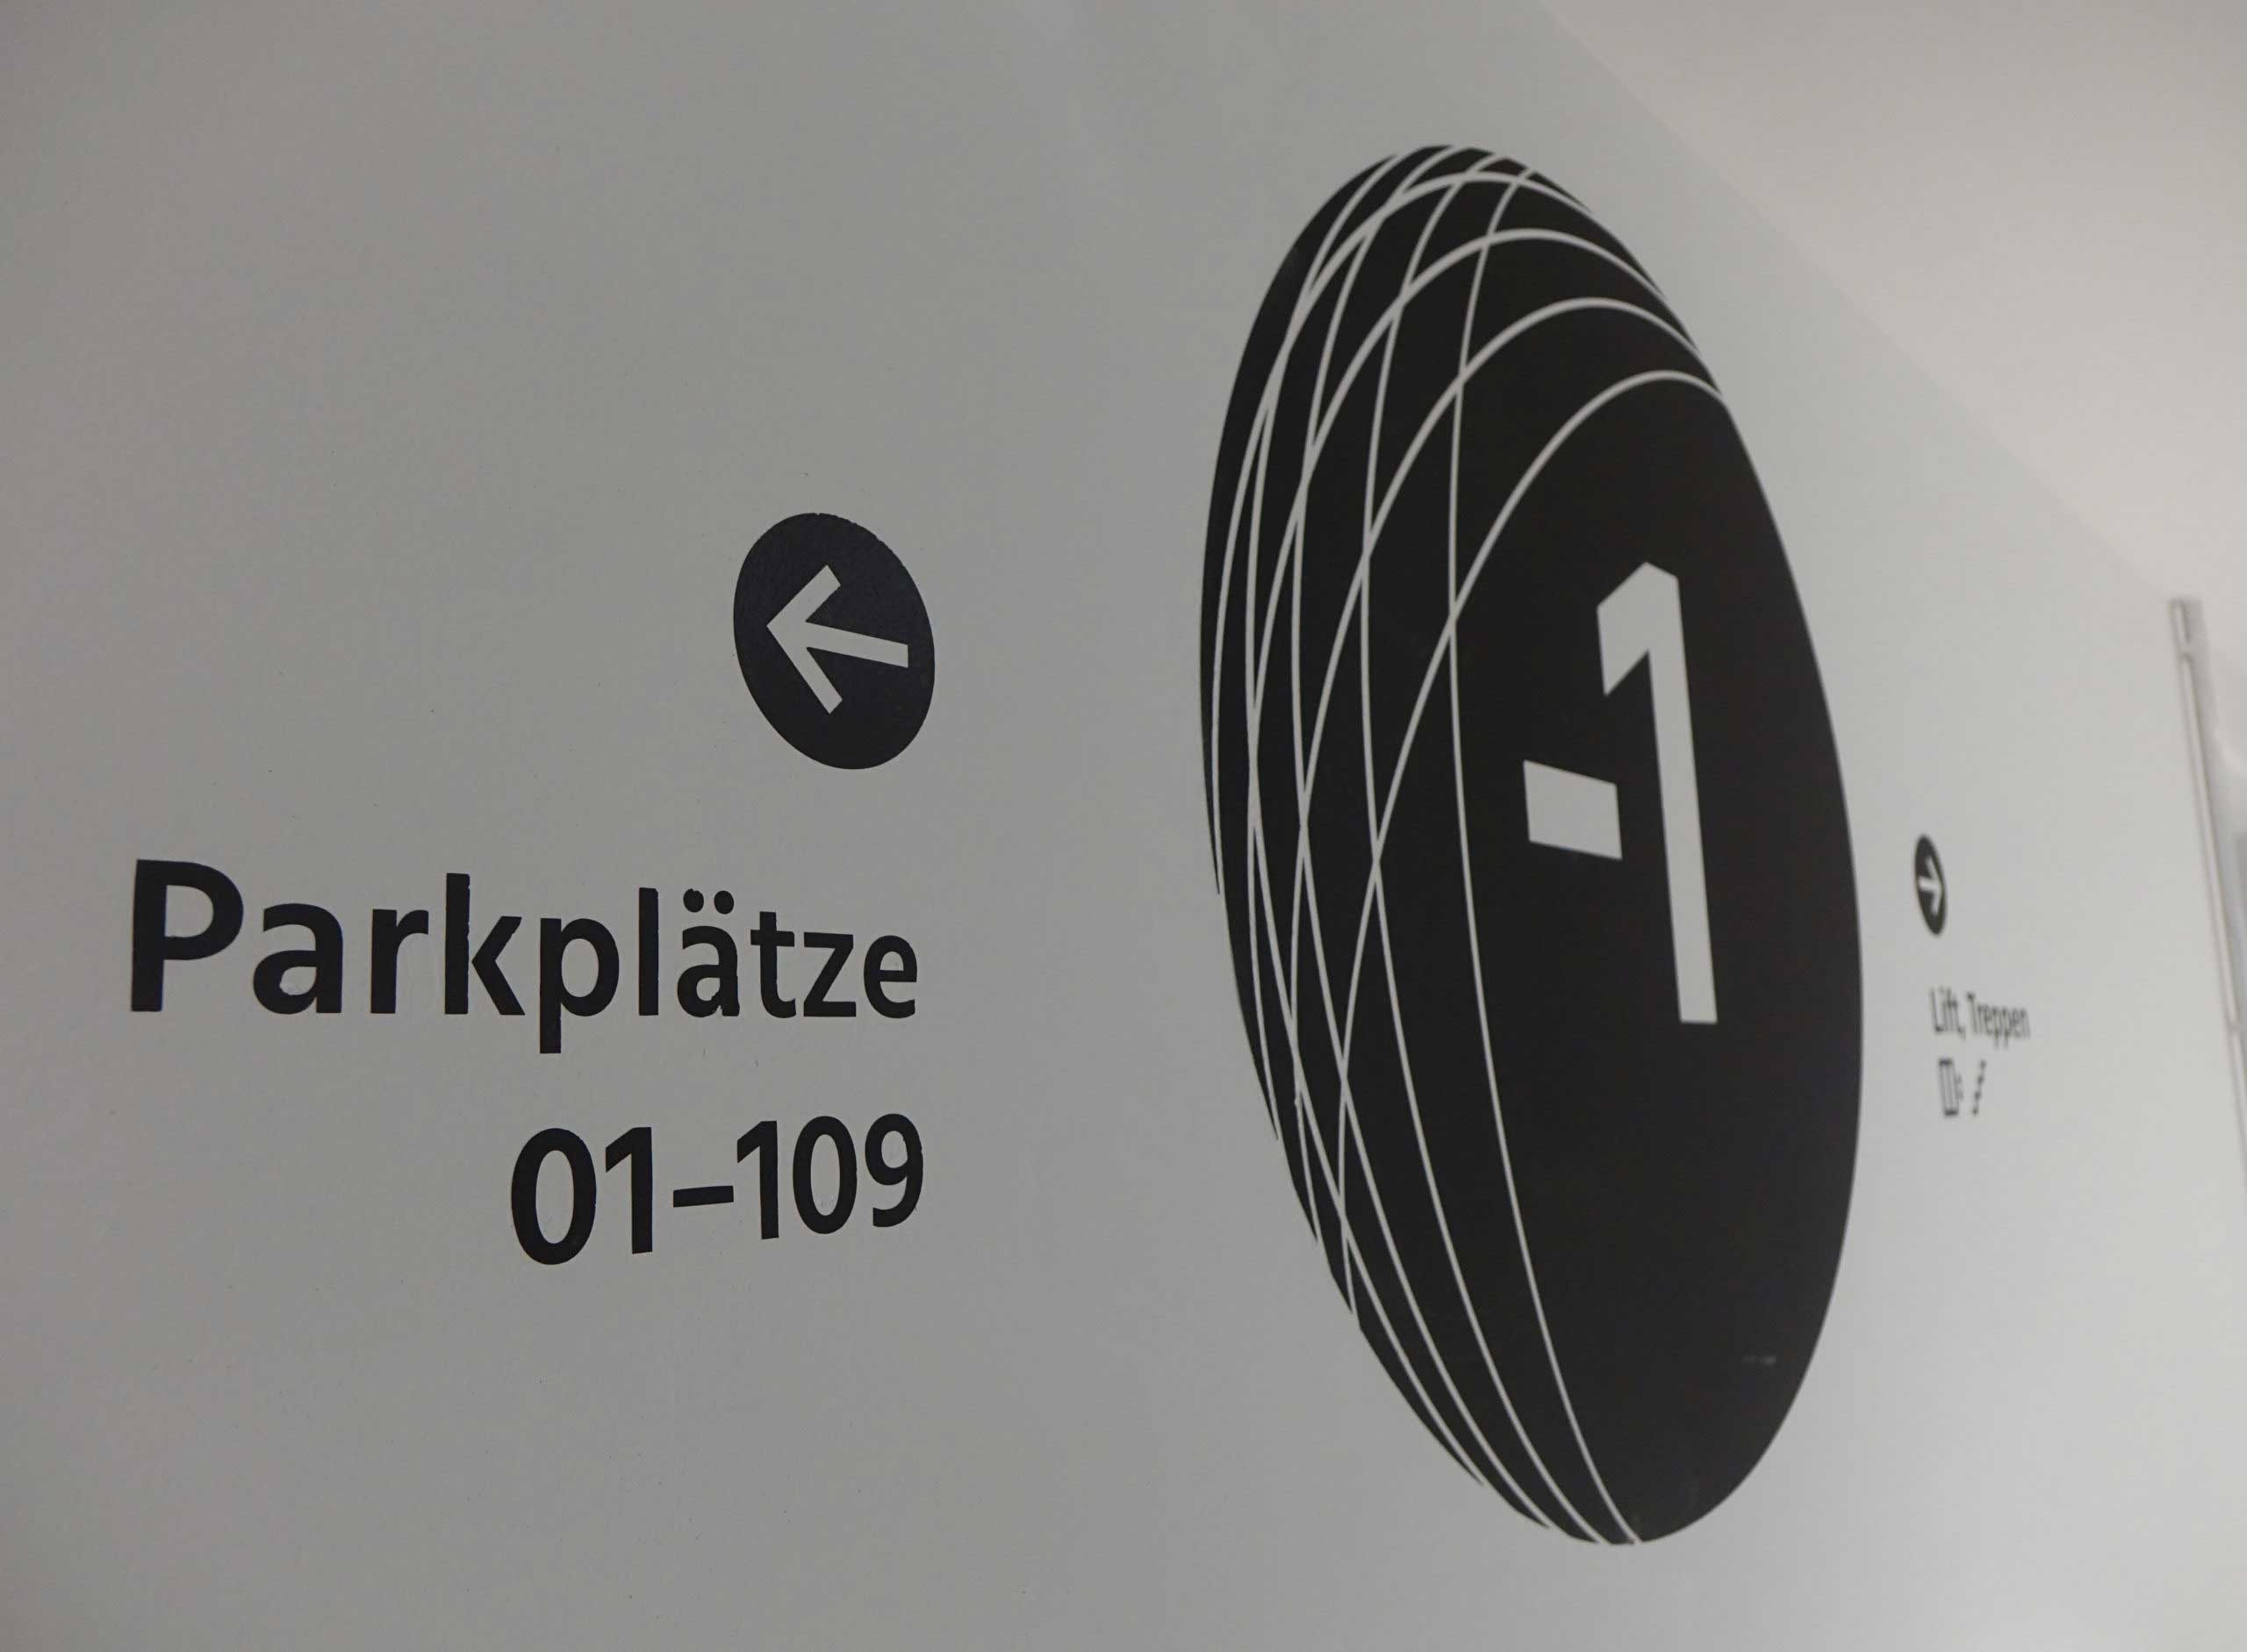 parkplatze